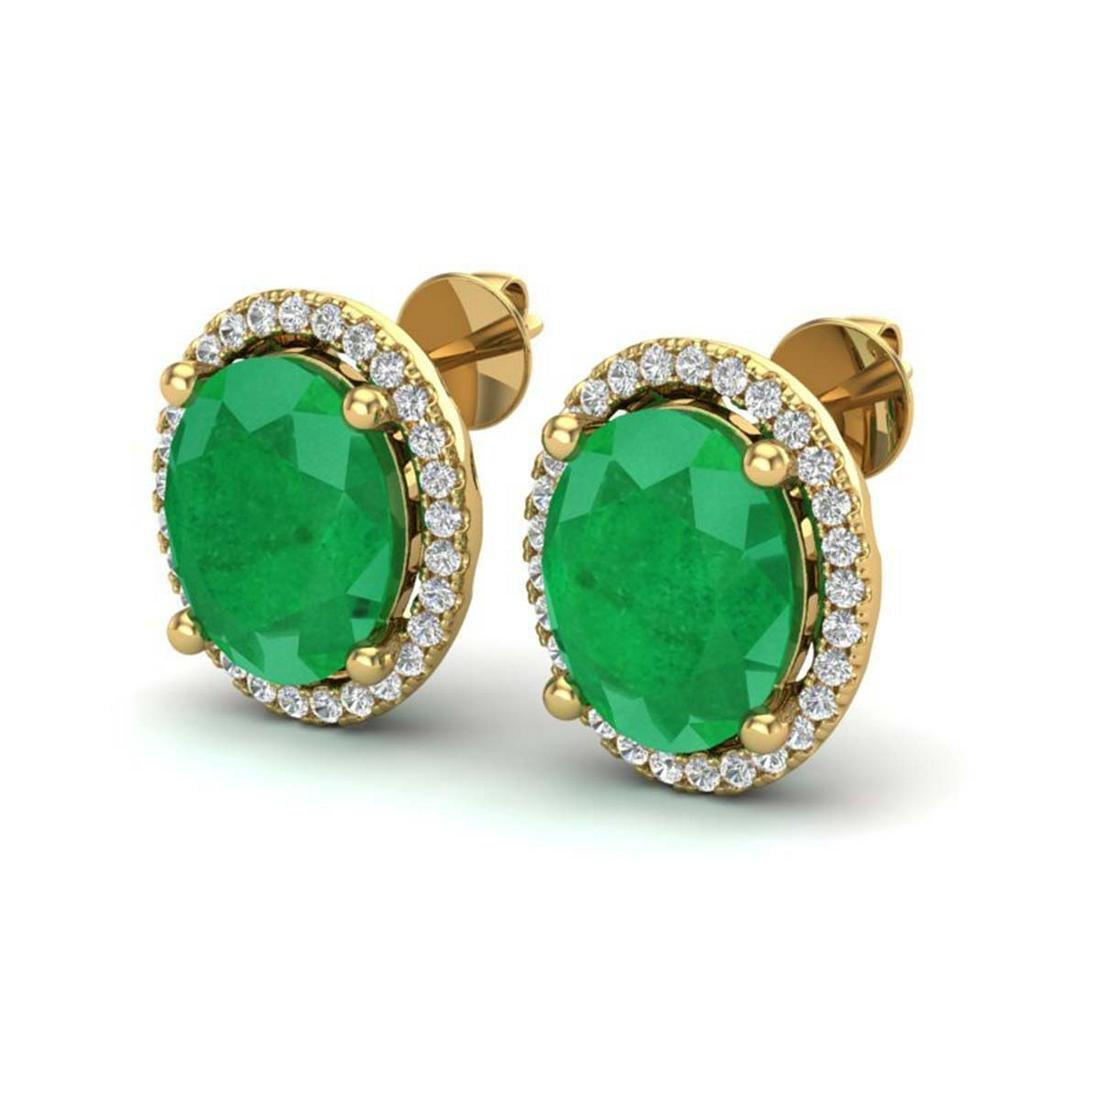 6 ctw Emerald & VS/SI Diamond Earrings 18K Yellow Gold